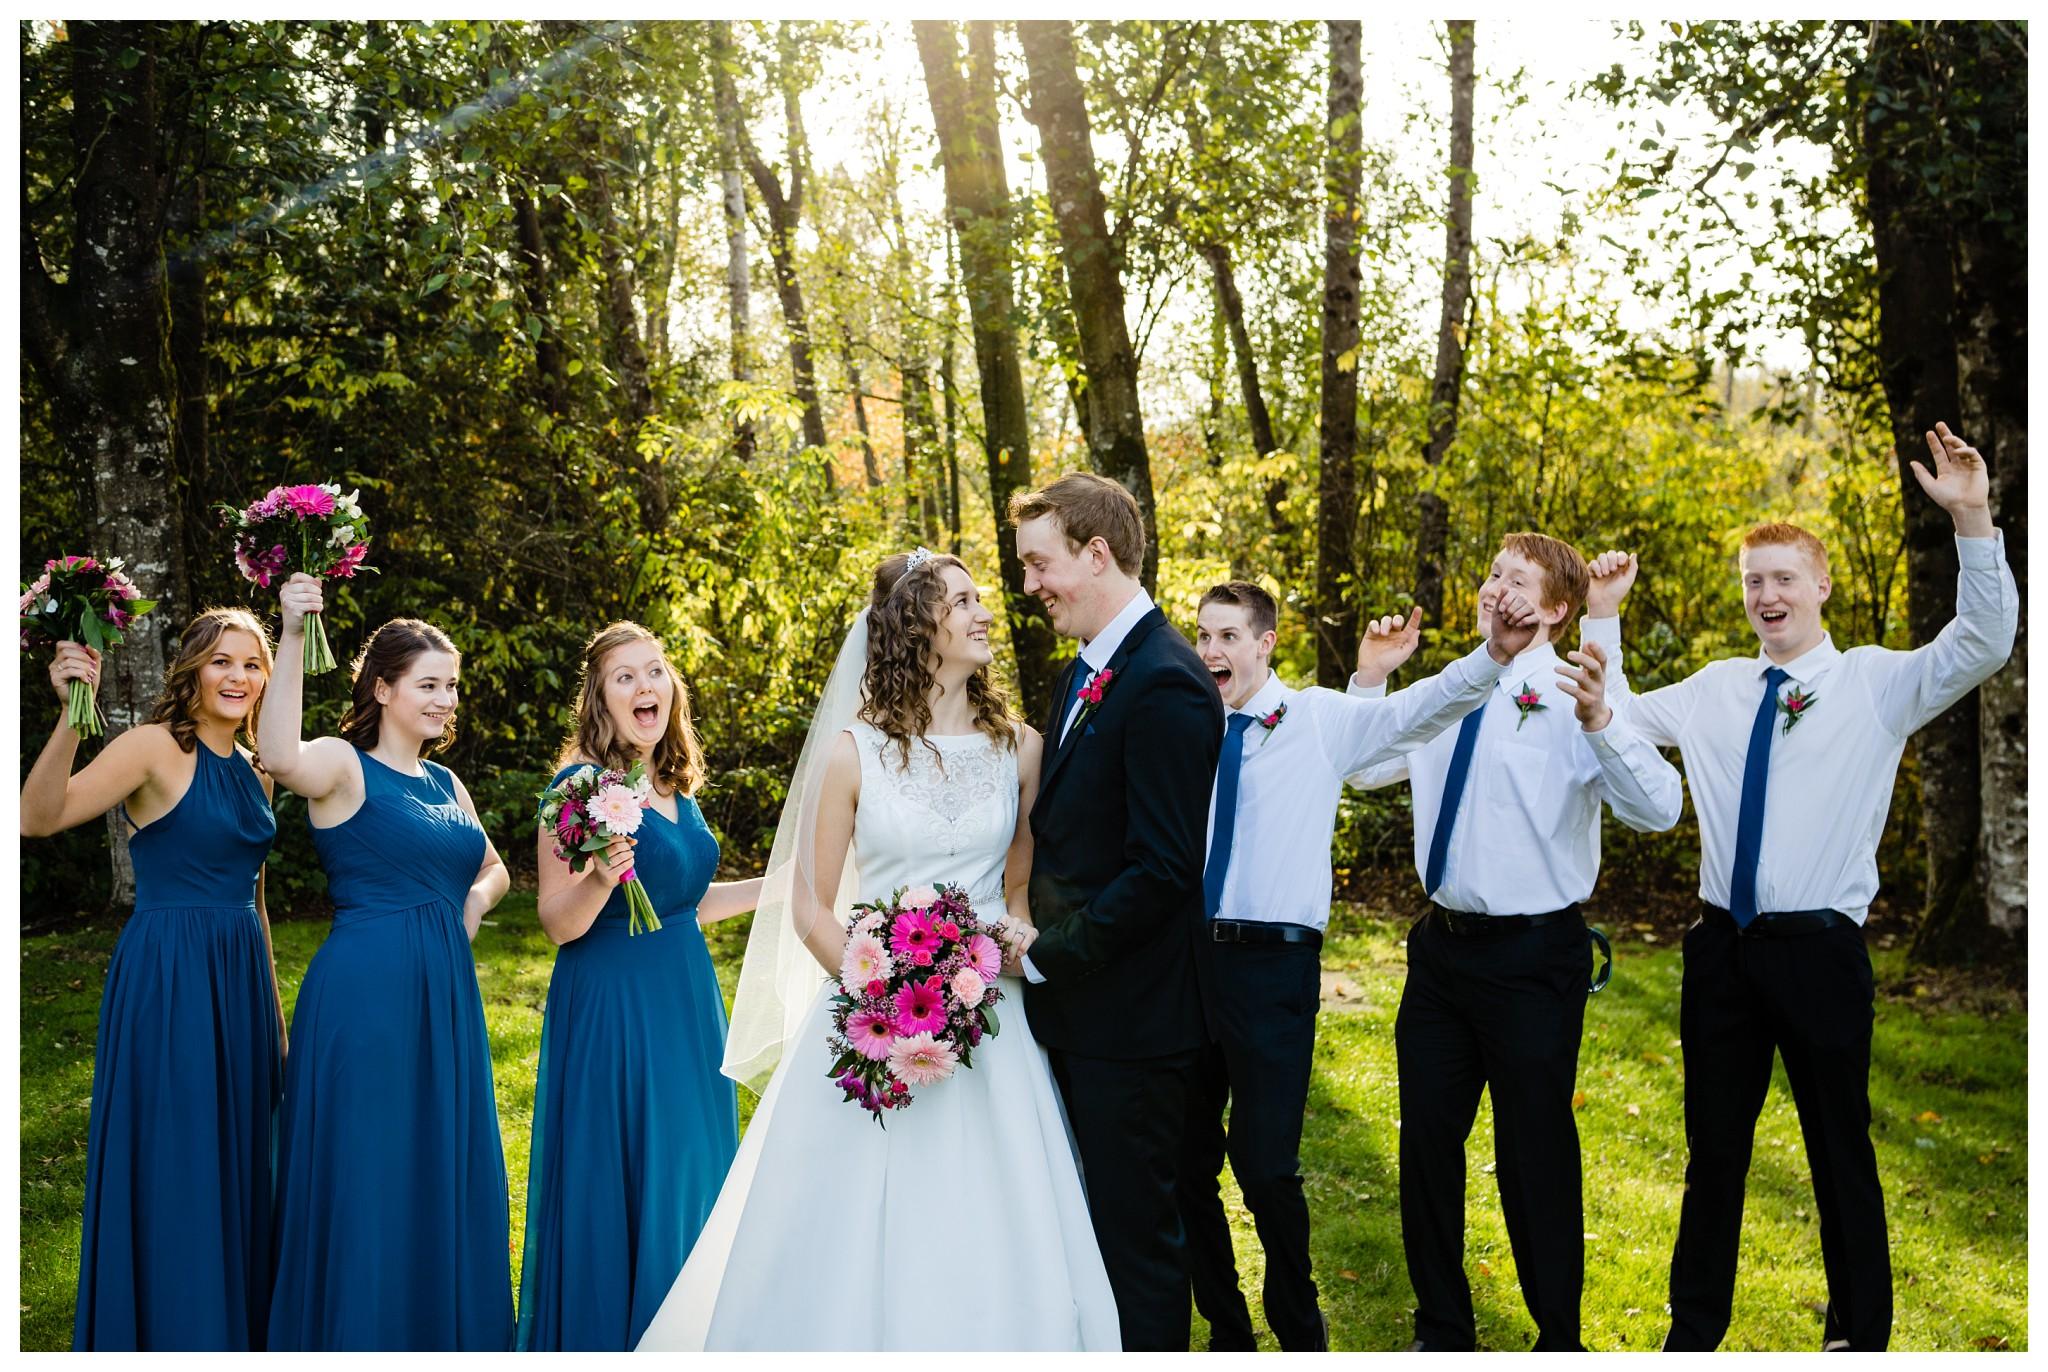 Aldergrove Park Christian Church Wedding Photography Pink Flowers Blue Bridesmaid Dress Fall_0105.jpg